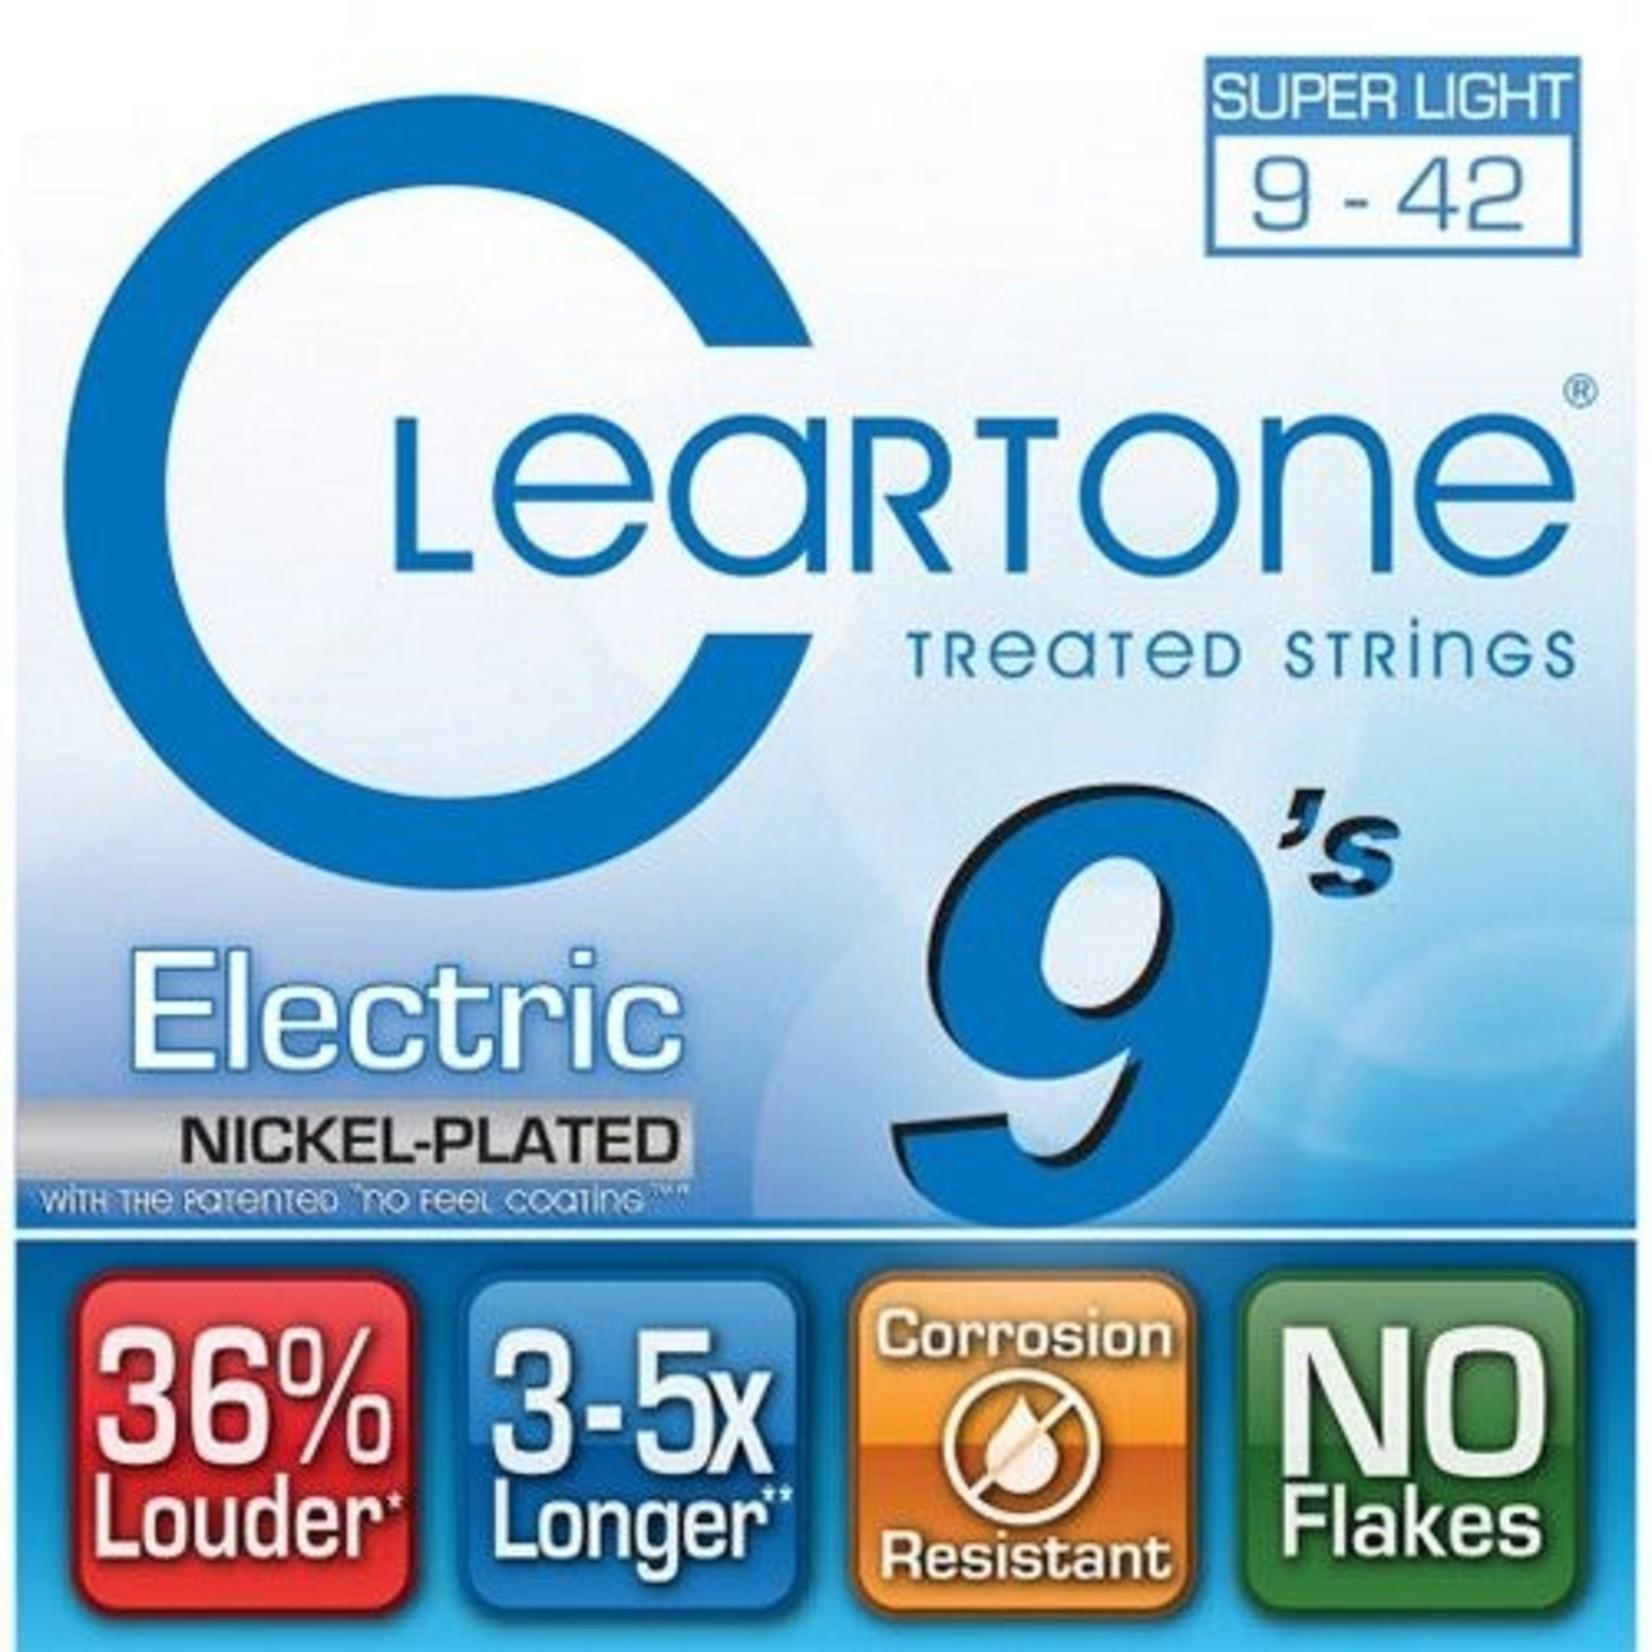 CLEARTONE 9409 ELECTRIQUE CLEARTONE